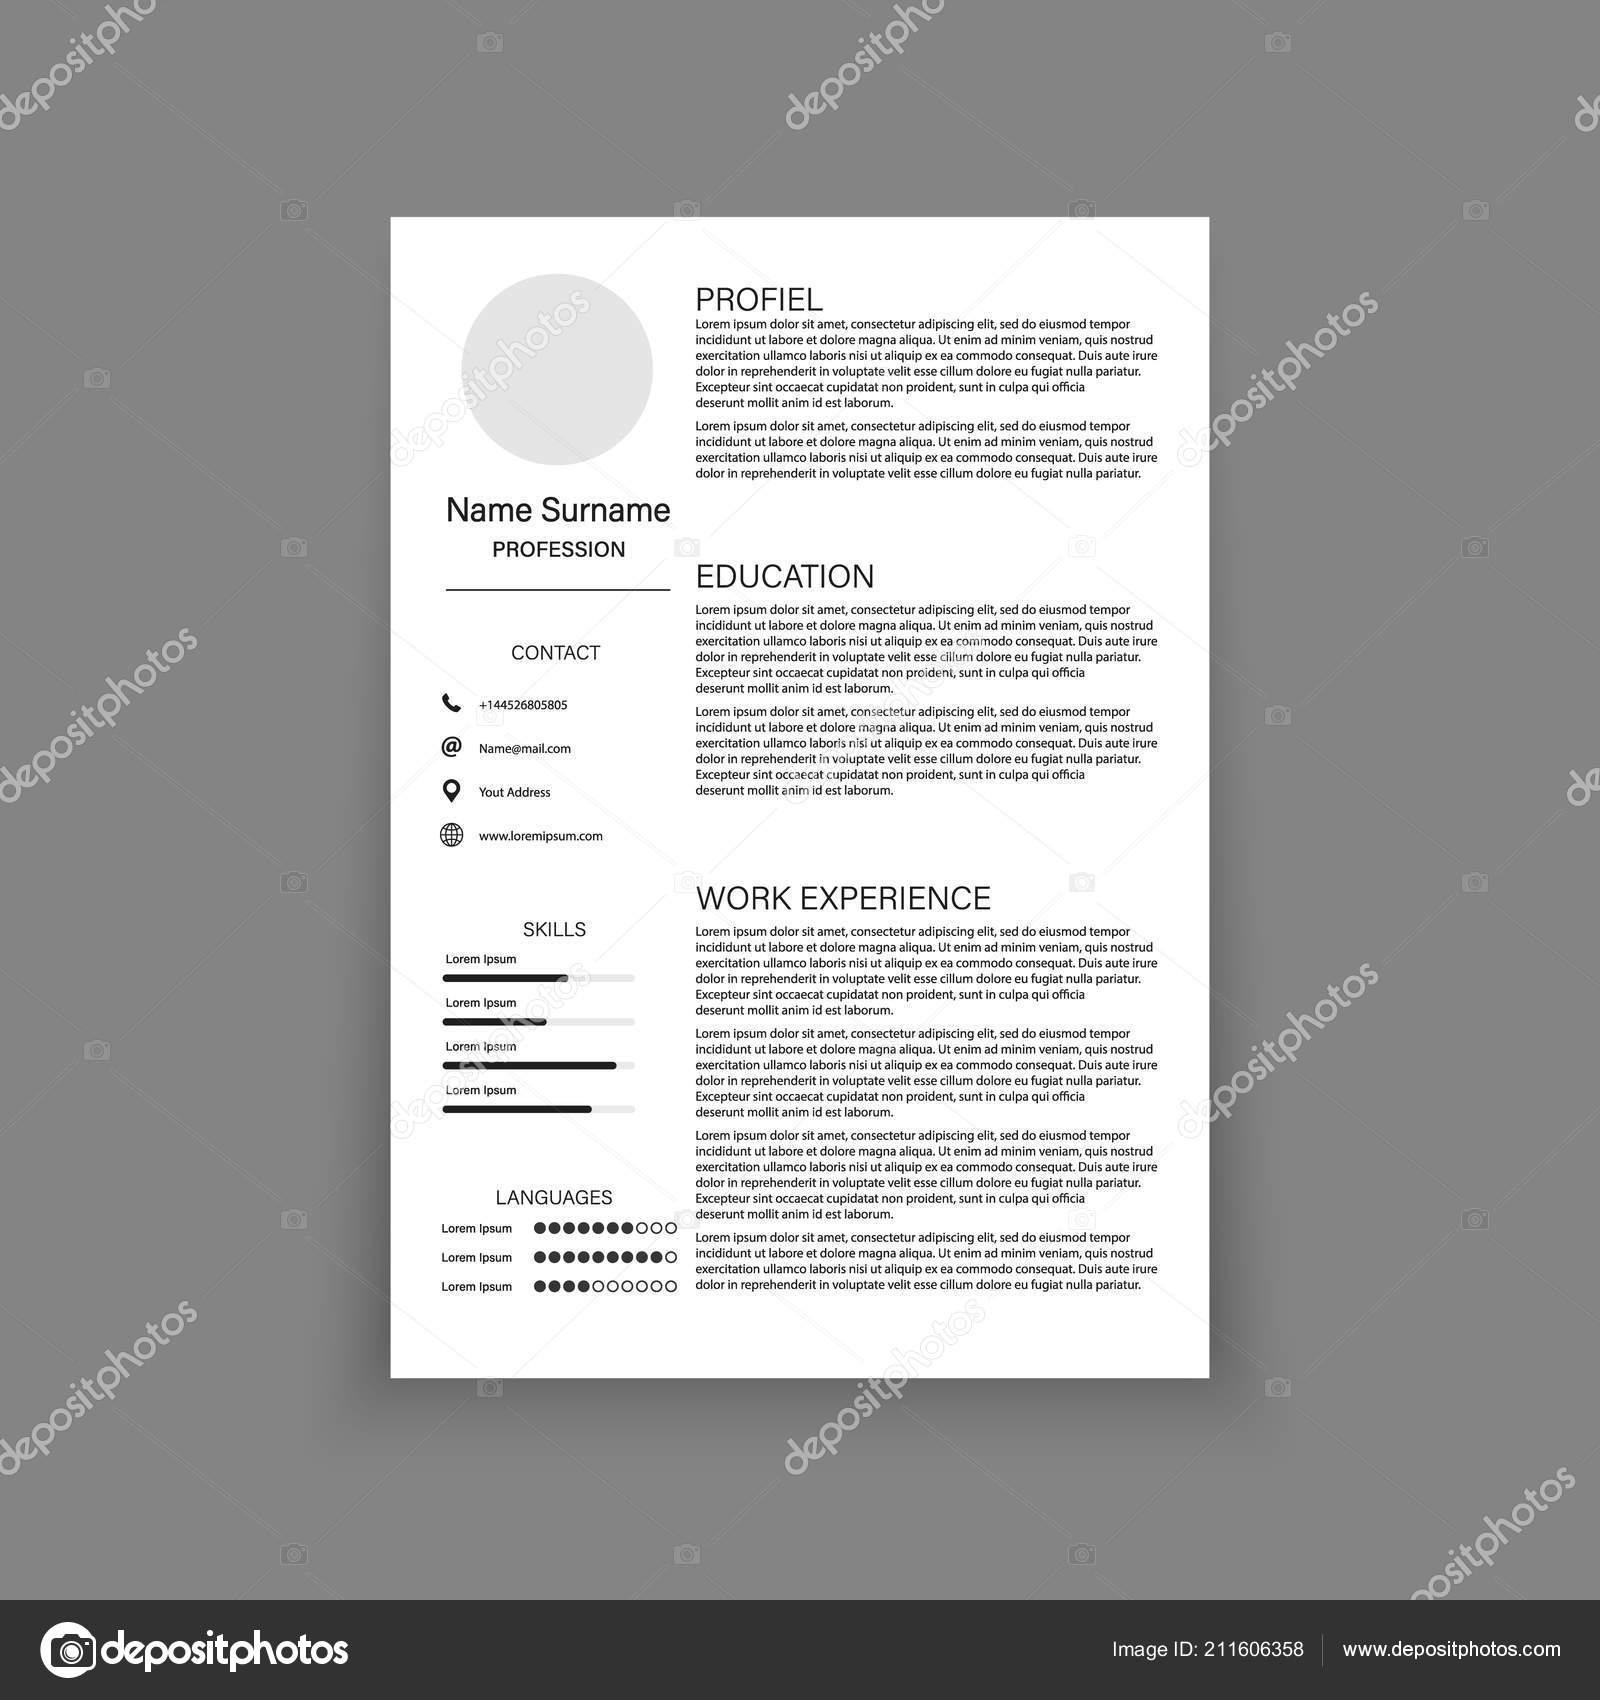 Cv Resume Template Design For A Creative Person Vector Illustration